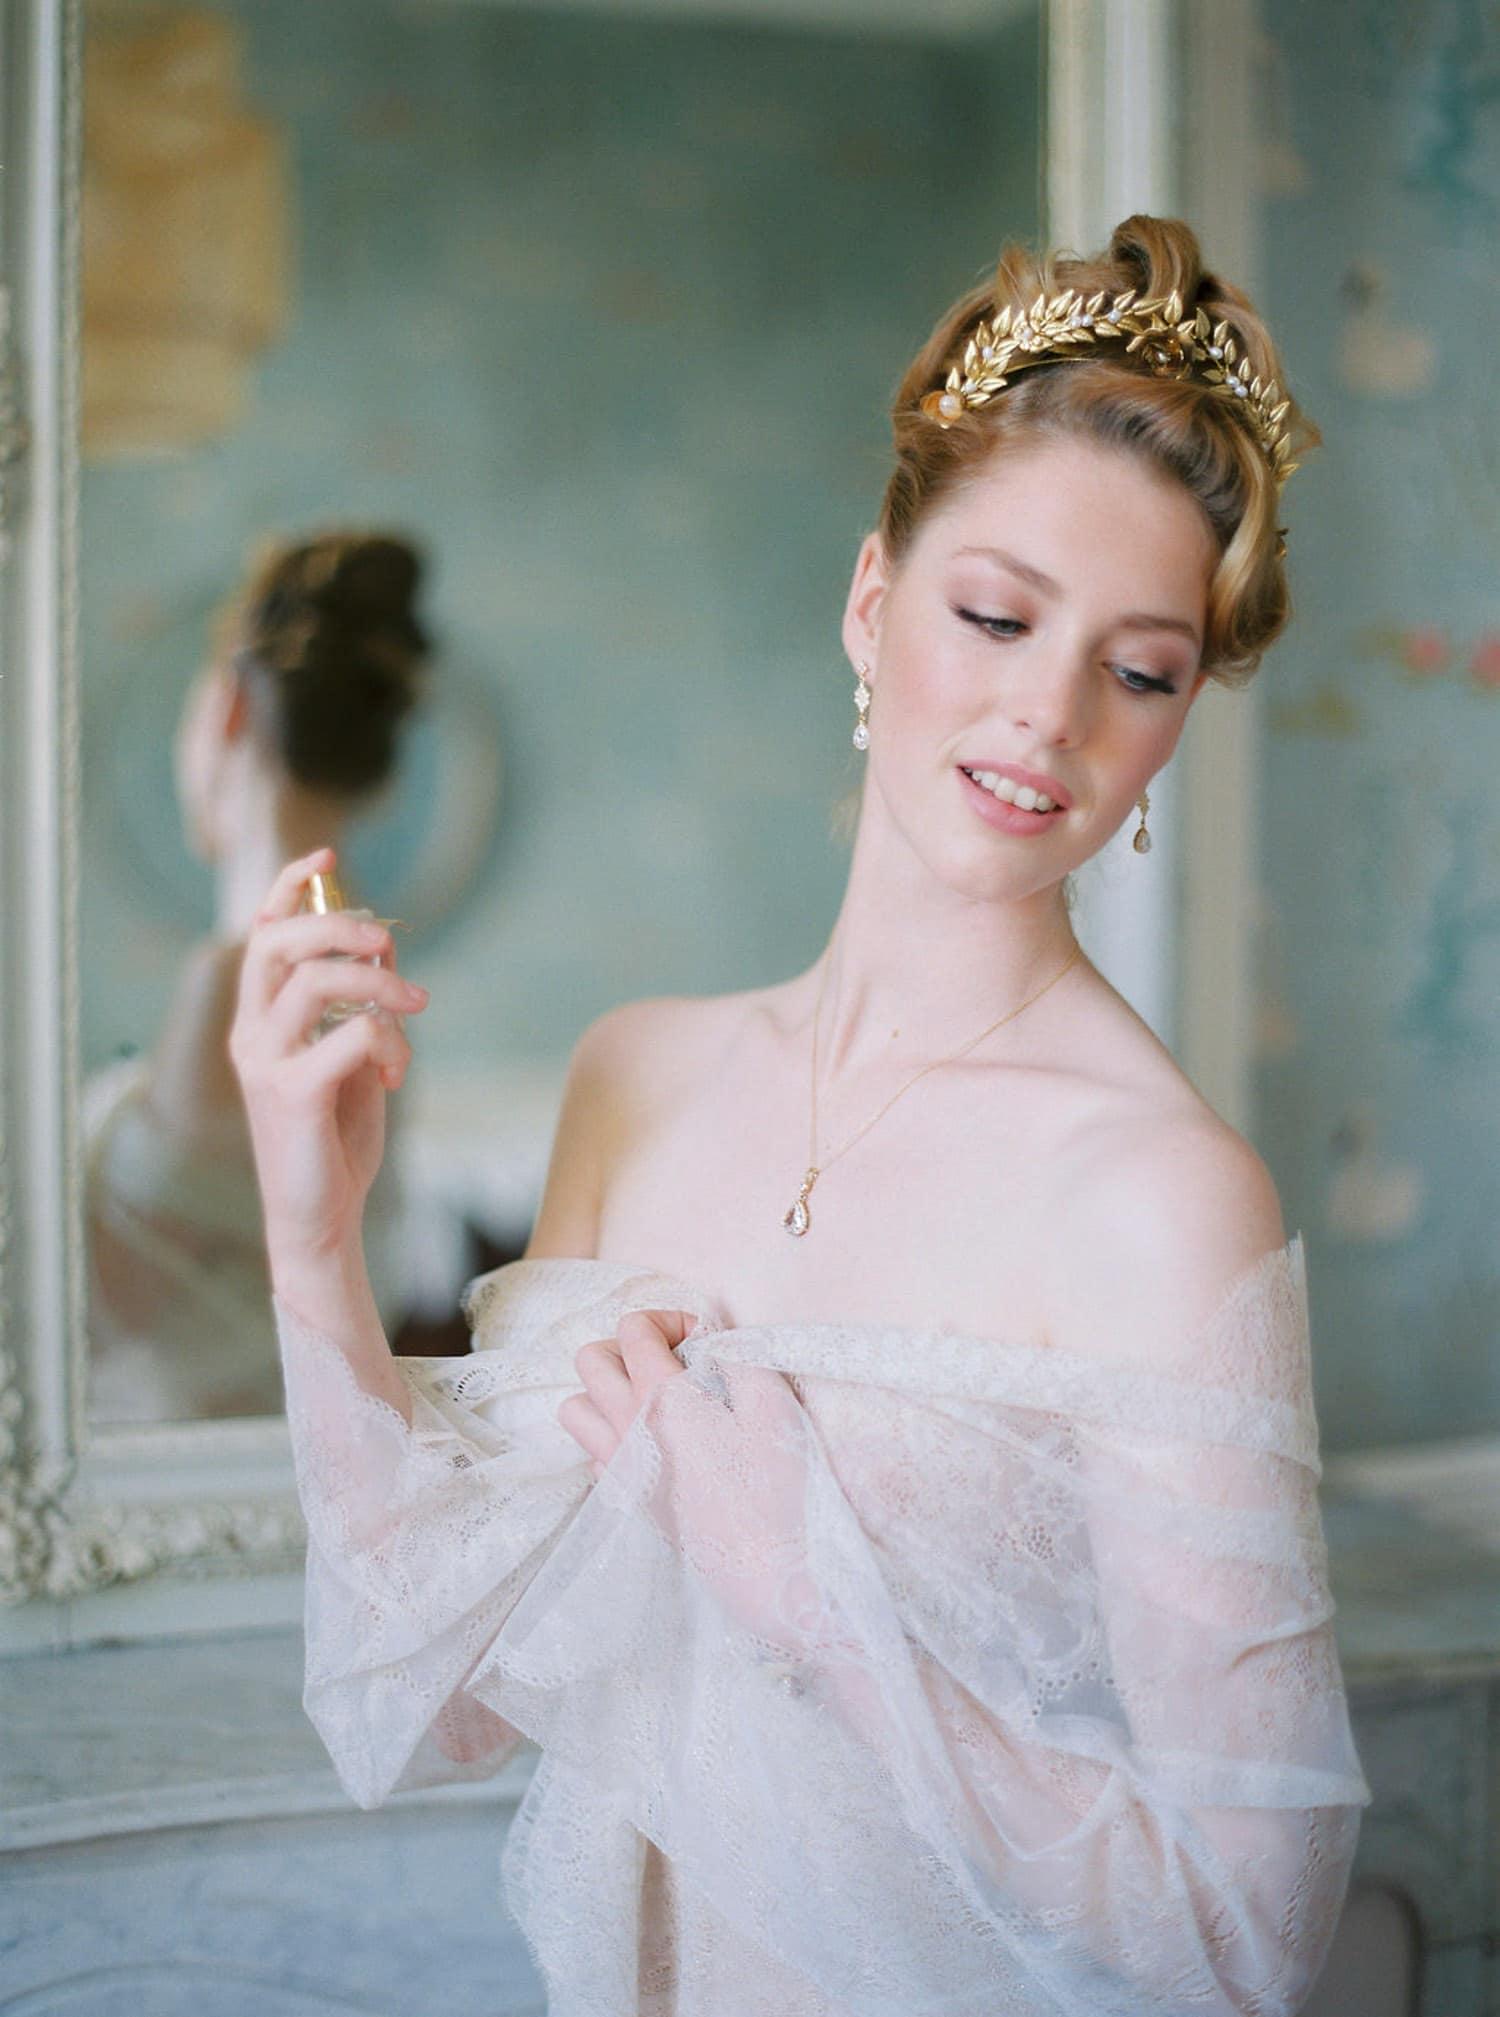 fineart bridal session, film photography, luxury wedding, French riviera, creative director, wedding stylist